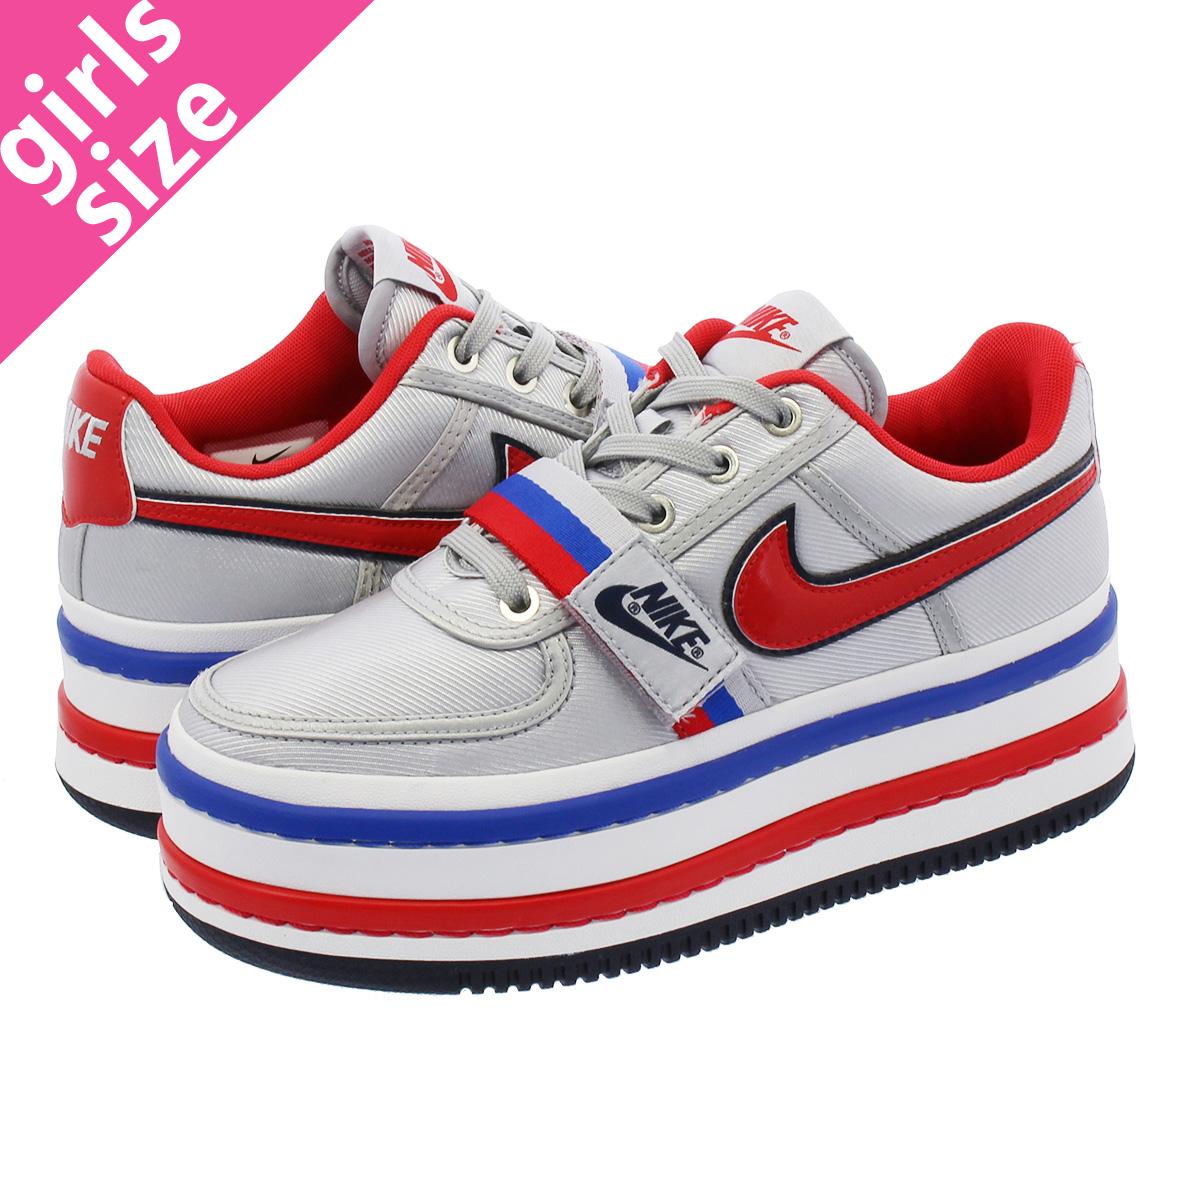 new styles f234a daaf3 NIKE WMNS VANDAL 2K Nike women Vandal 2K METALLIC SILVER UNIVERSITY RED  ao2868-001-l